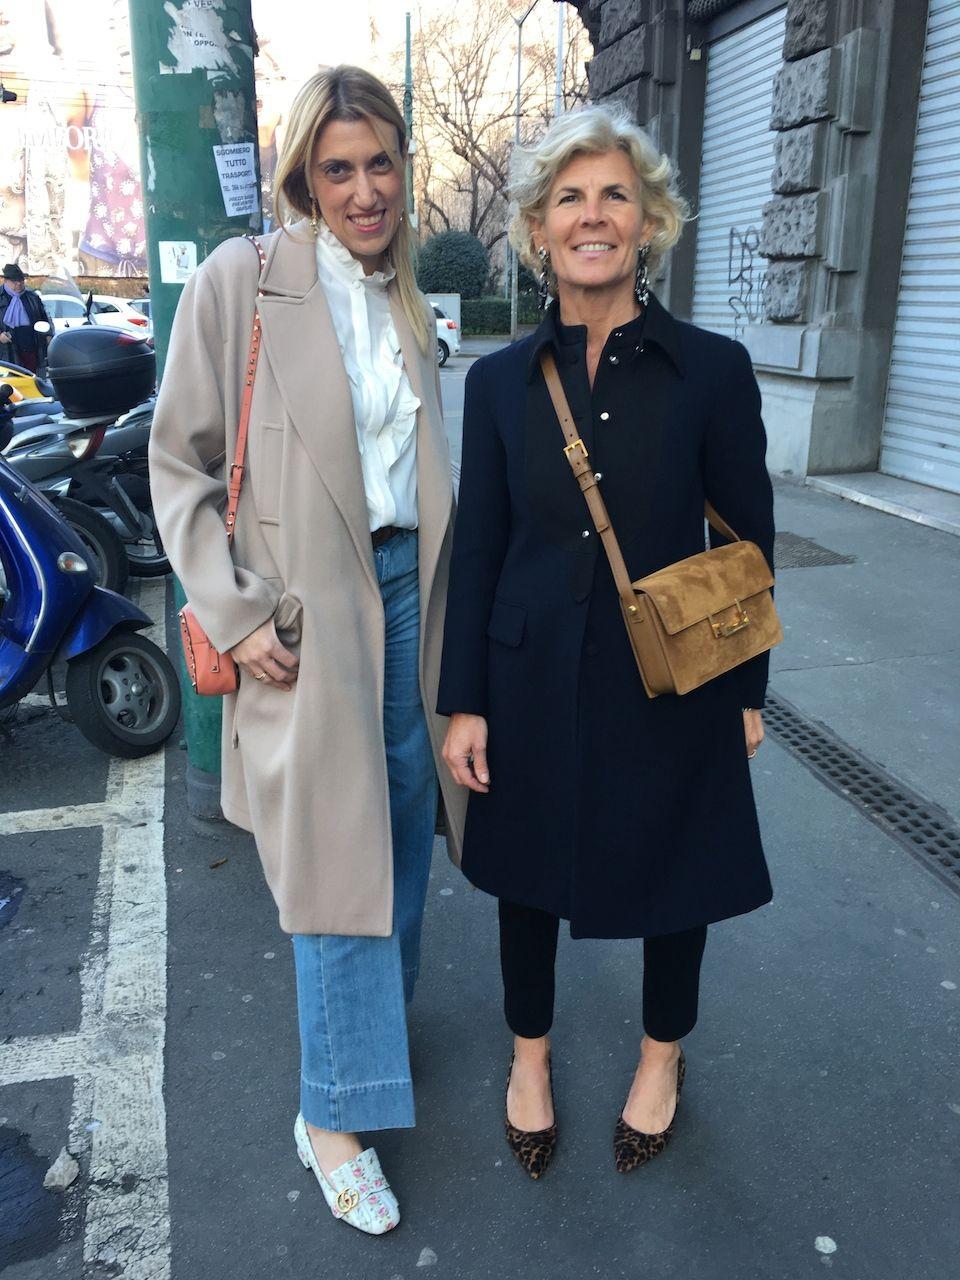 Wonderful people in the streets of Milan